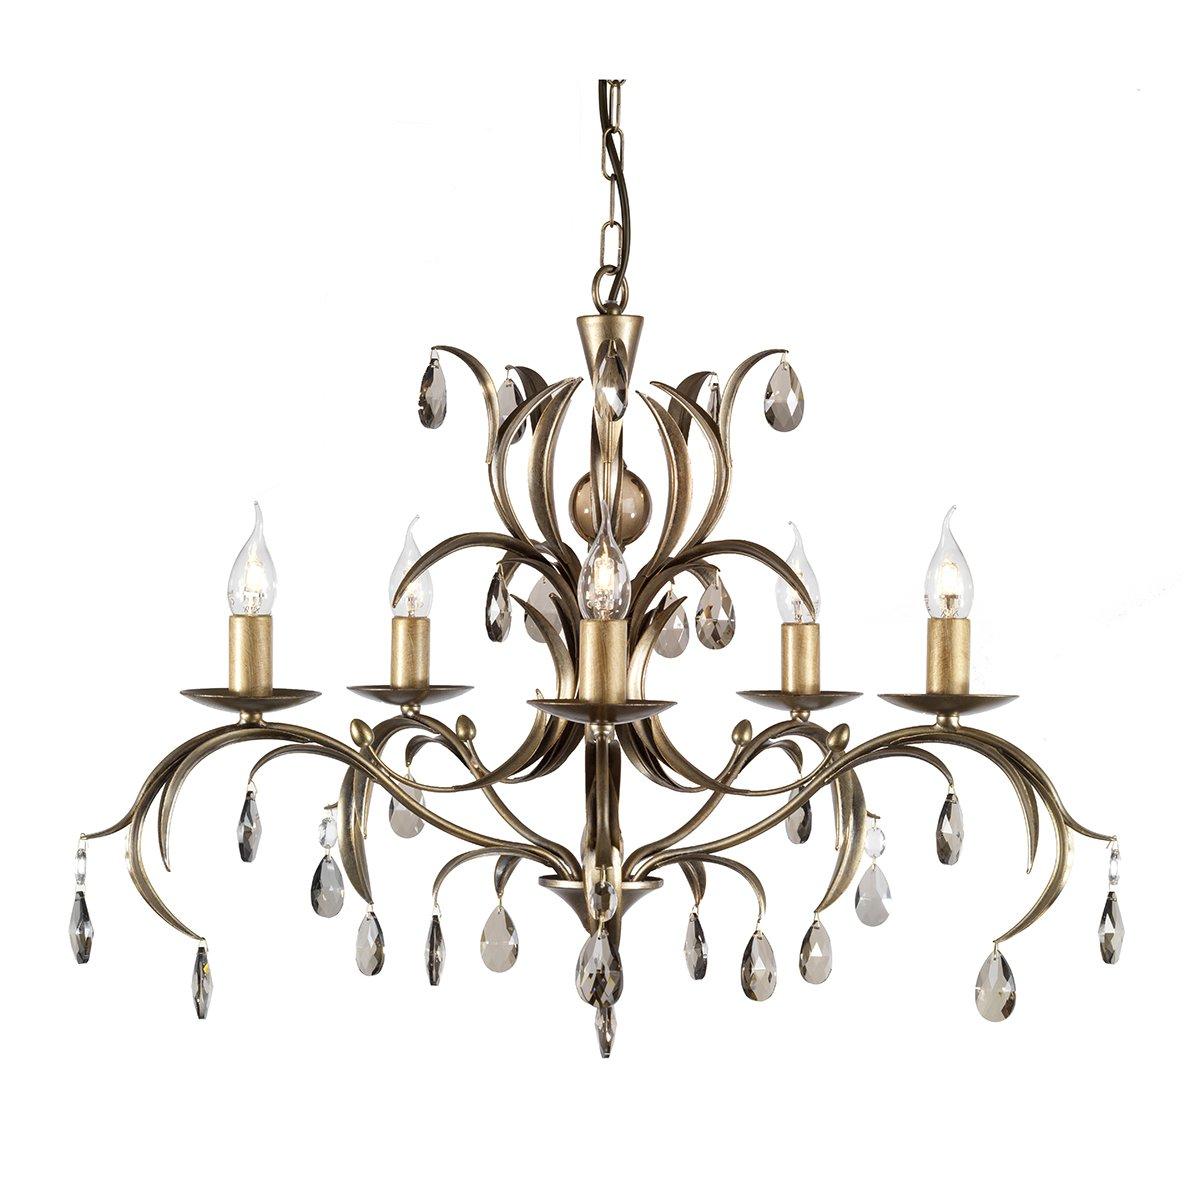 Elstead Lighting Wandlampe Lily 5 Licht Kronleuchter Deckenleuchte Antik Bronze ANT BRZ